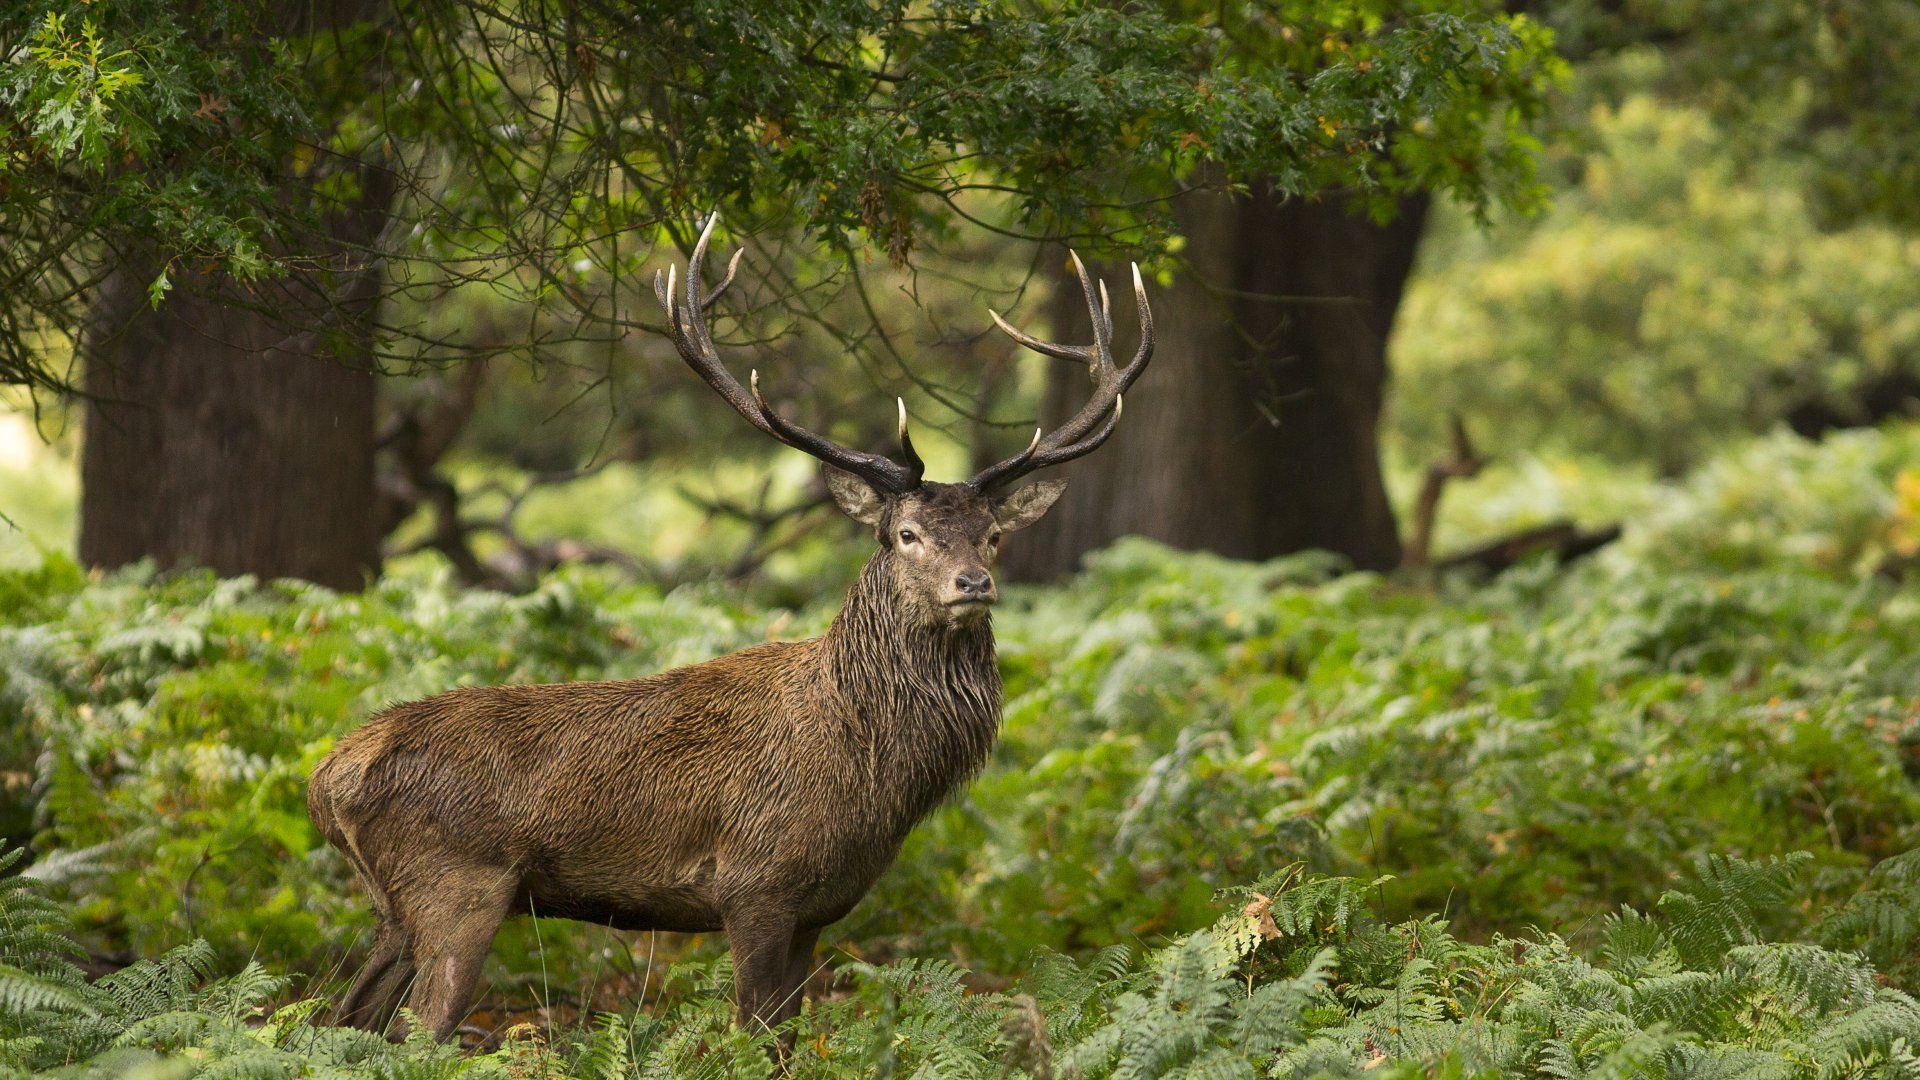 Deer In The Forest Wallpaper